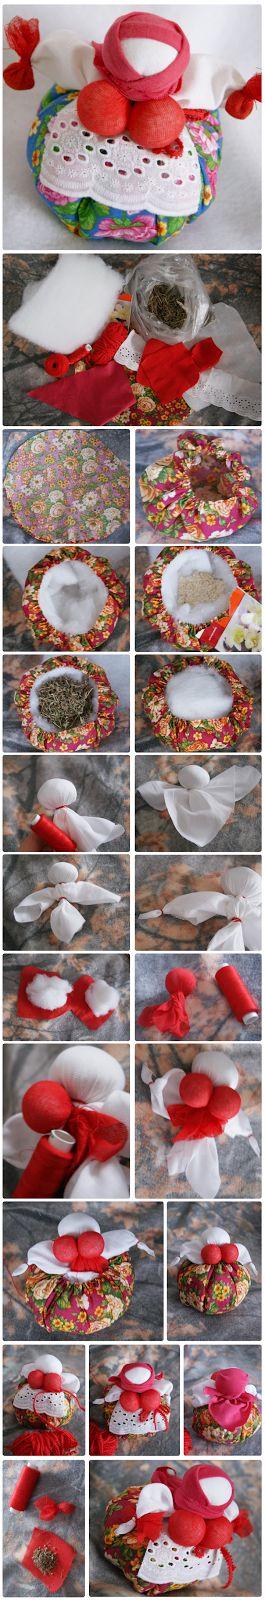 Traditional russian doll kubyshka-travnitza filled with herbs. Guard of home and health. Step-by-step tutorial.   #babushka #handmade